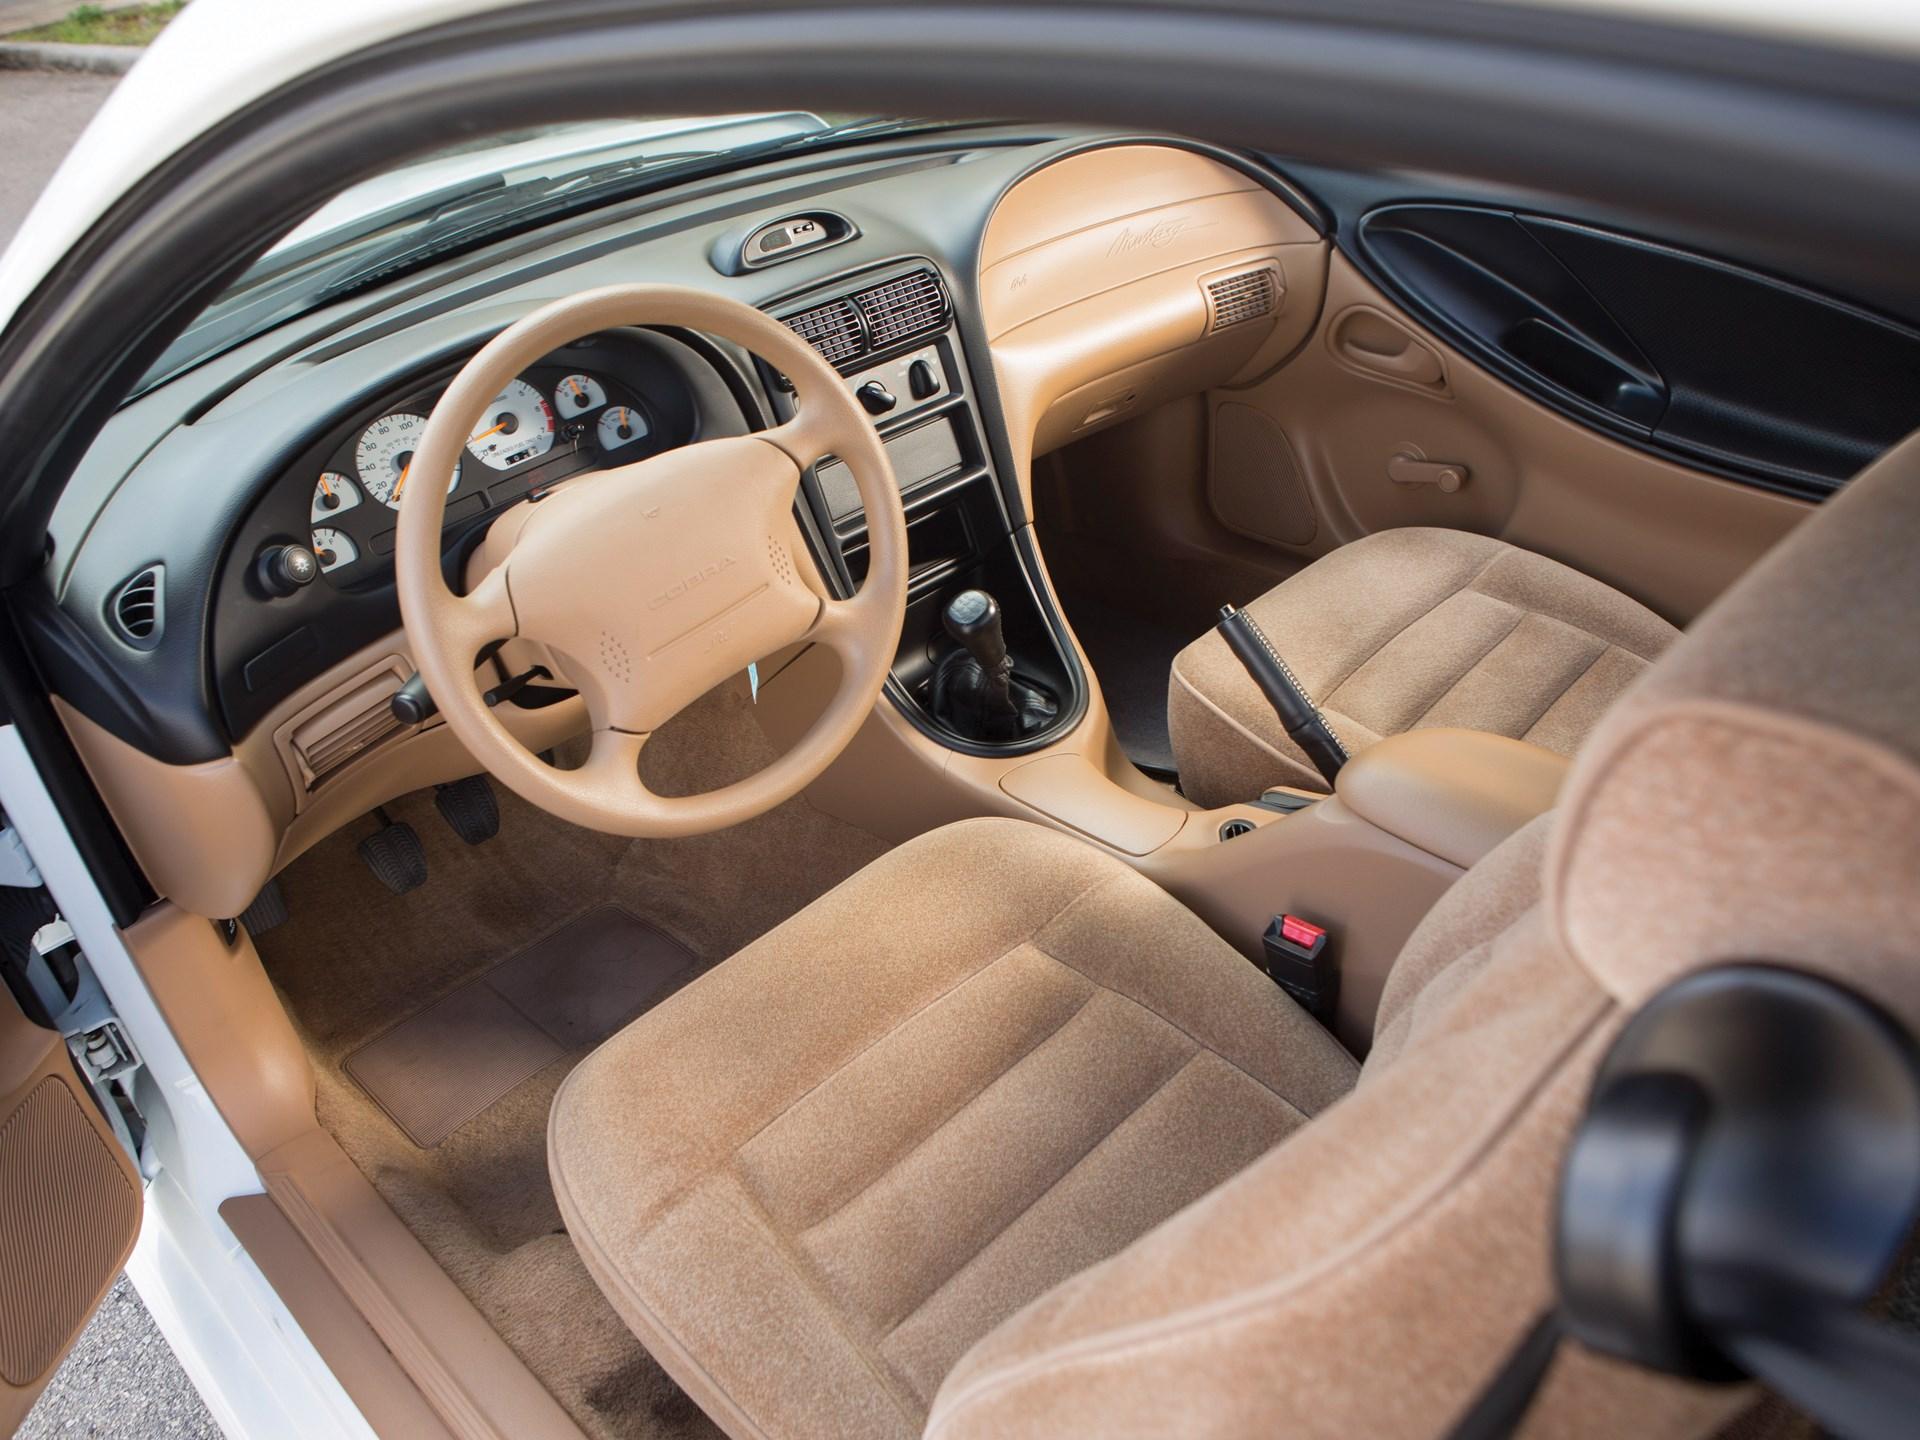 1995 Ford Mustang SVT Cobra R driver interior